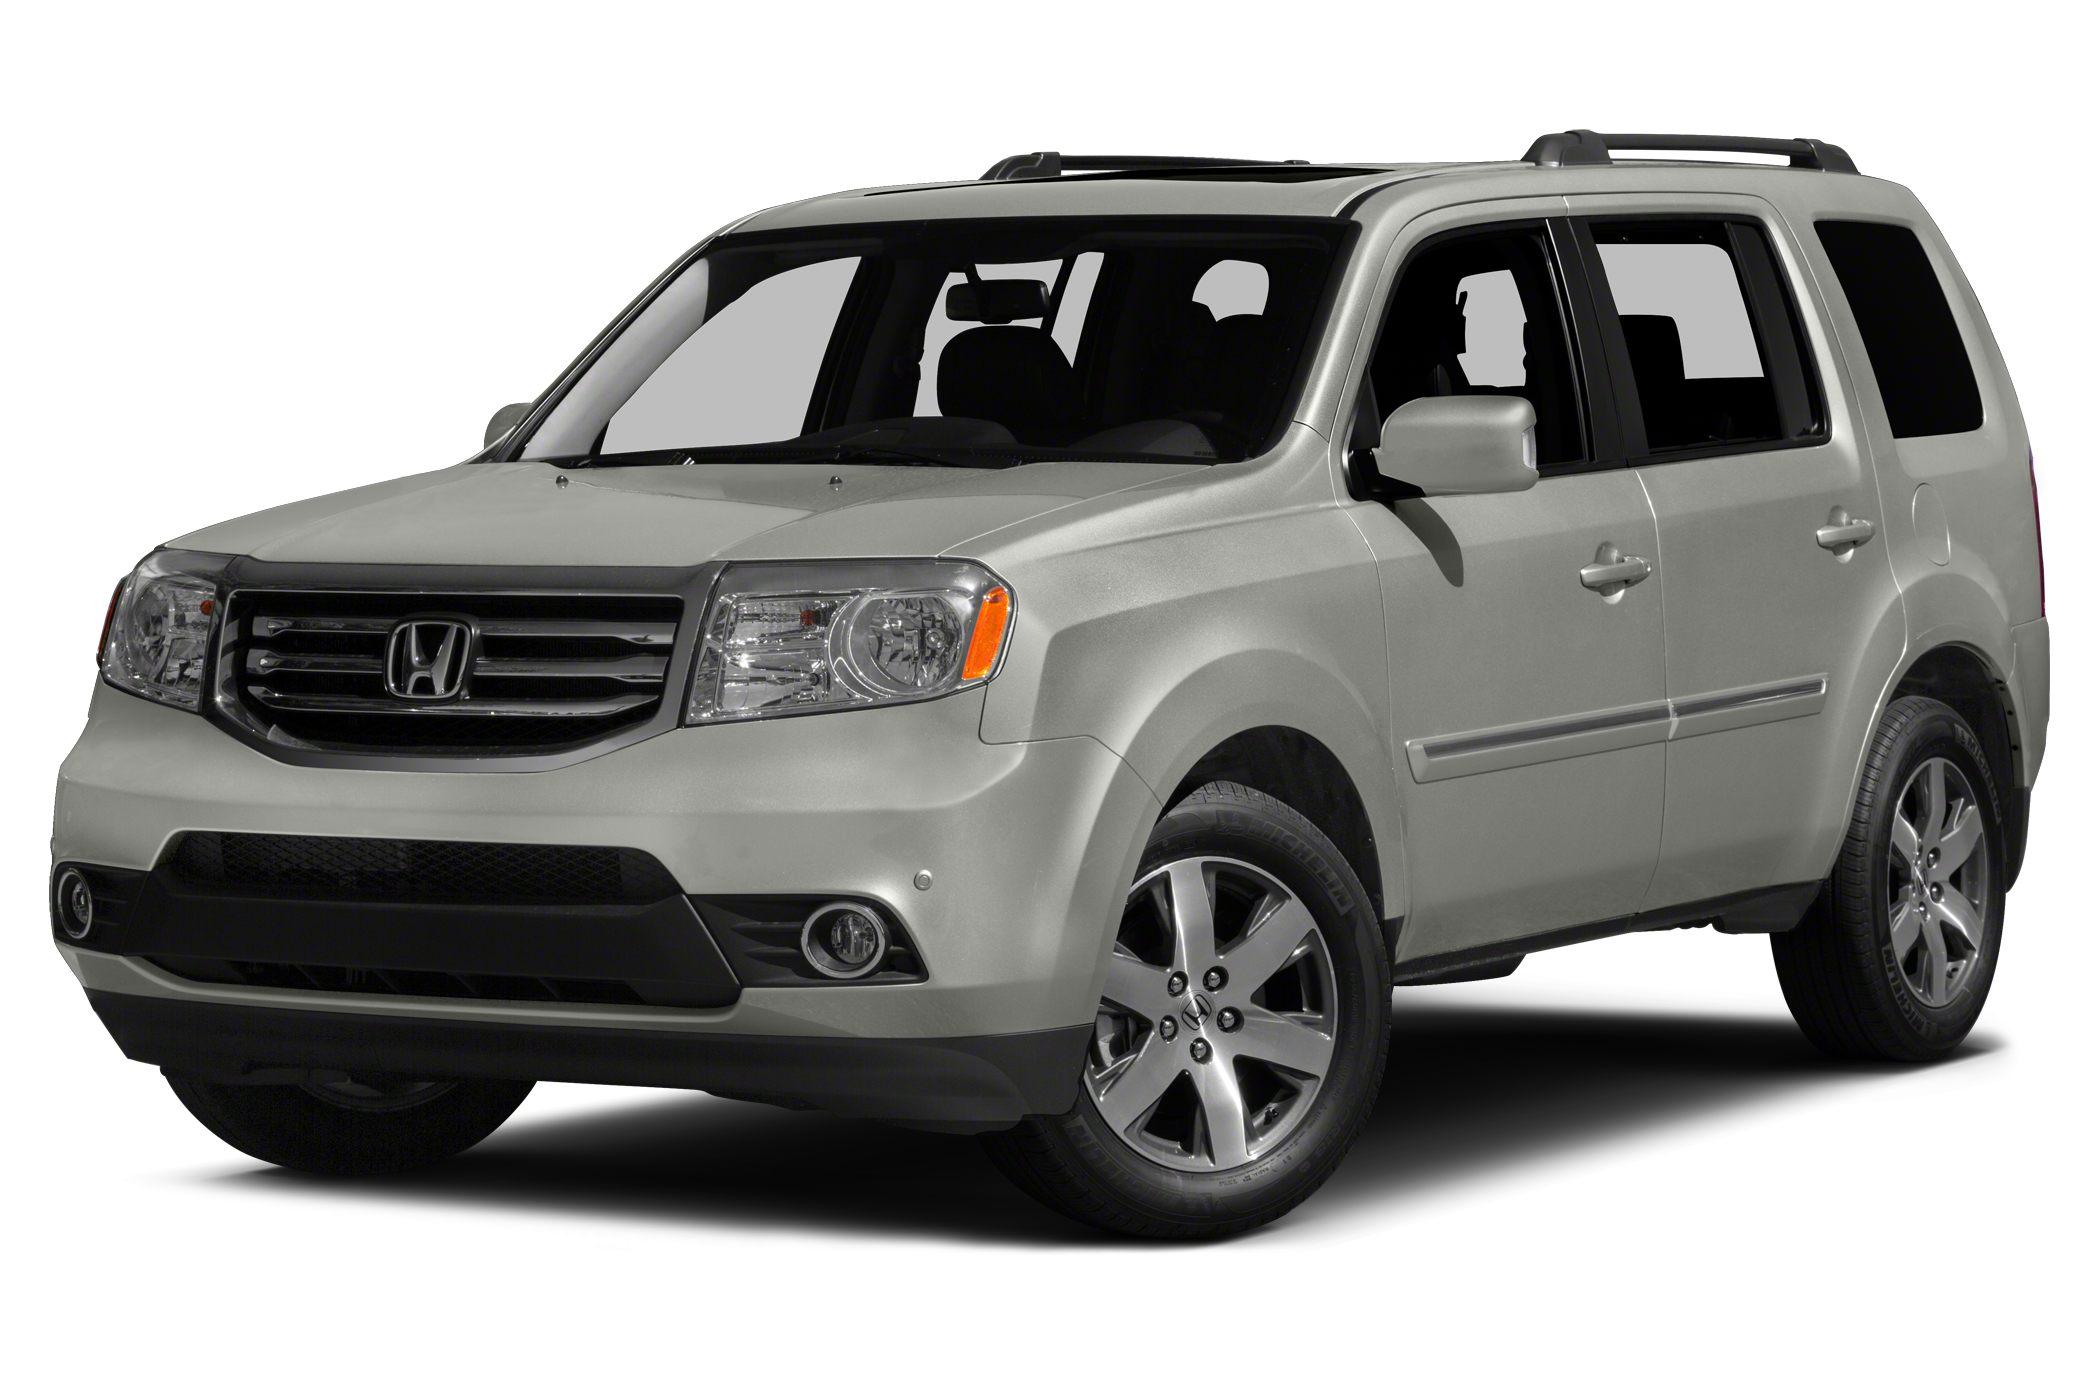 2013 Honda Pilot Touring w RES Navigation David Stanley Norman Chrysler Jeep Dodge means busines